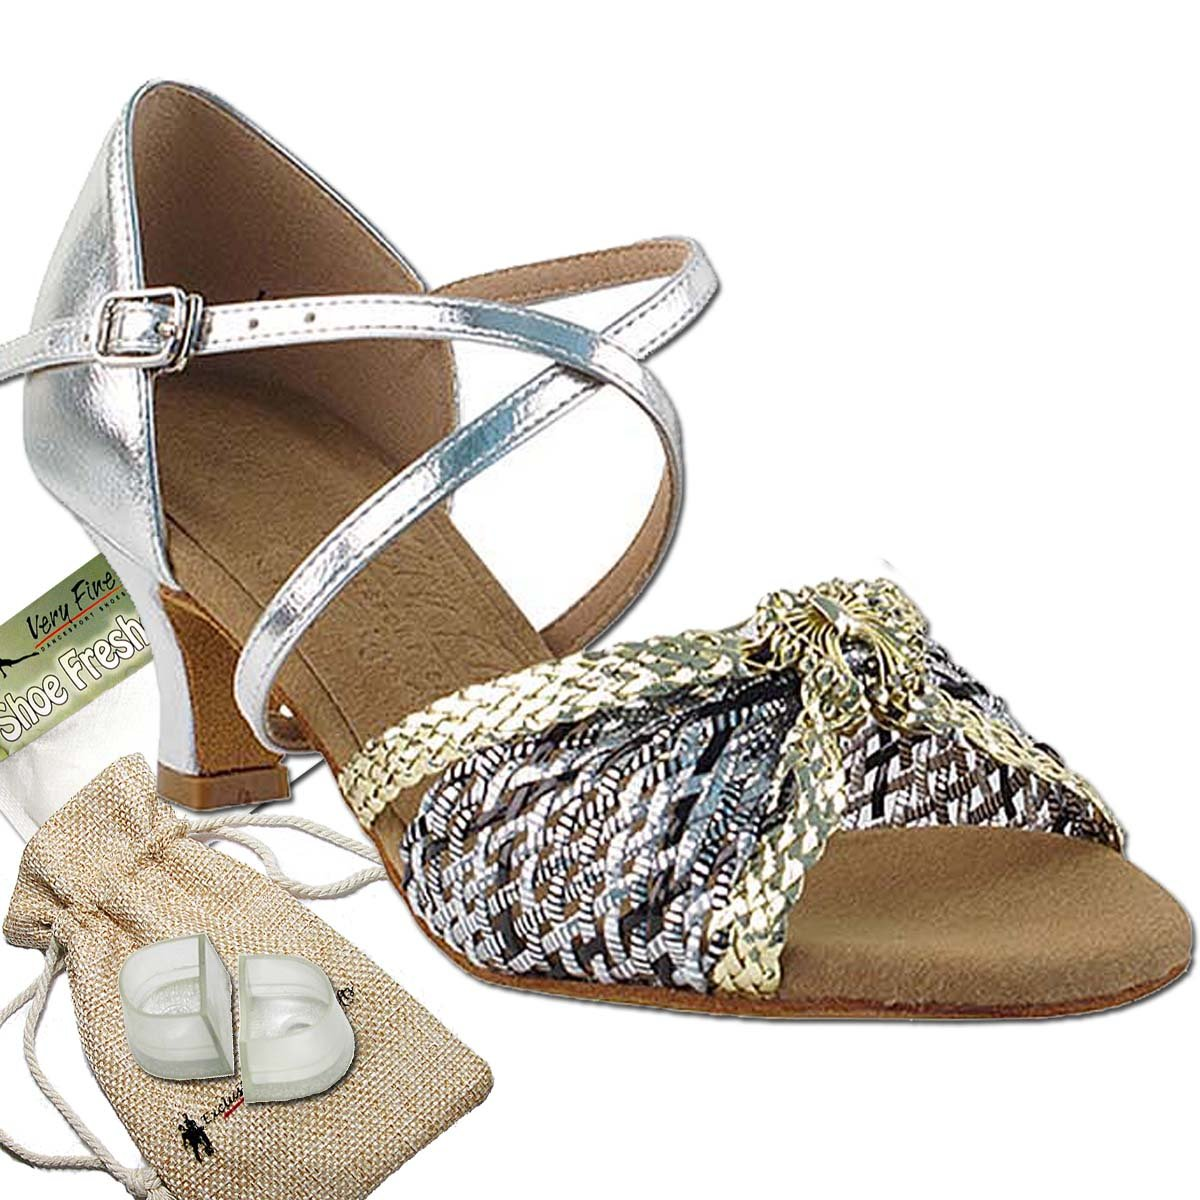 Women's Ballroom Dance Shoes Salsa Latin Practice Dance Shoes Gold & Silver Braid S92309EB Comfortable - Very Fine 2'' Heel 8 M US [Bundle of 5]